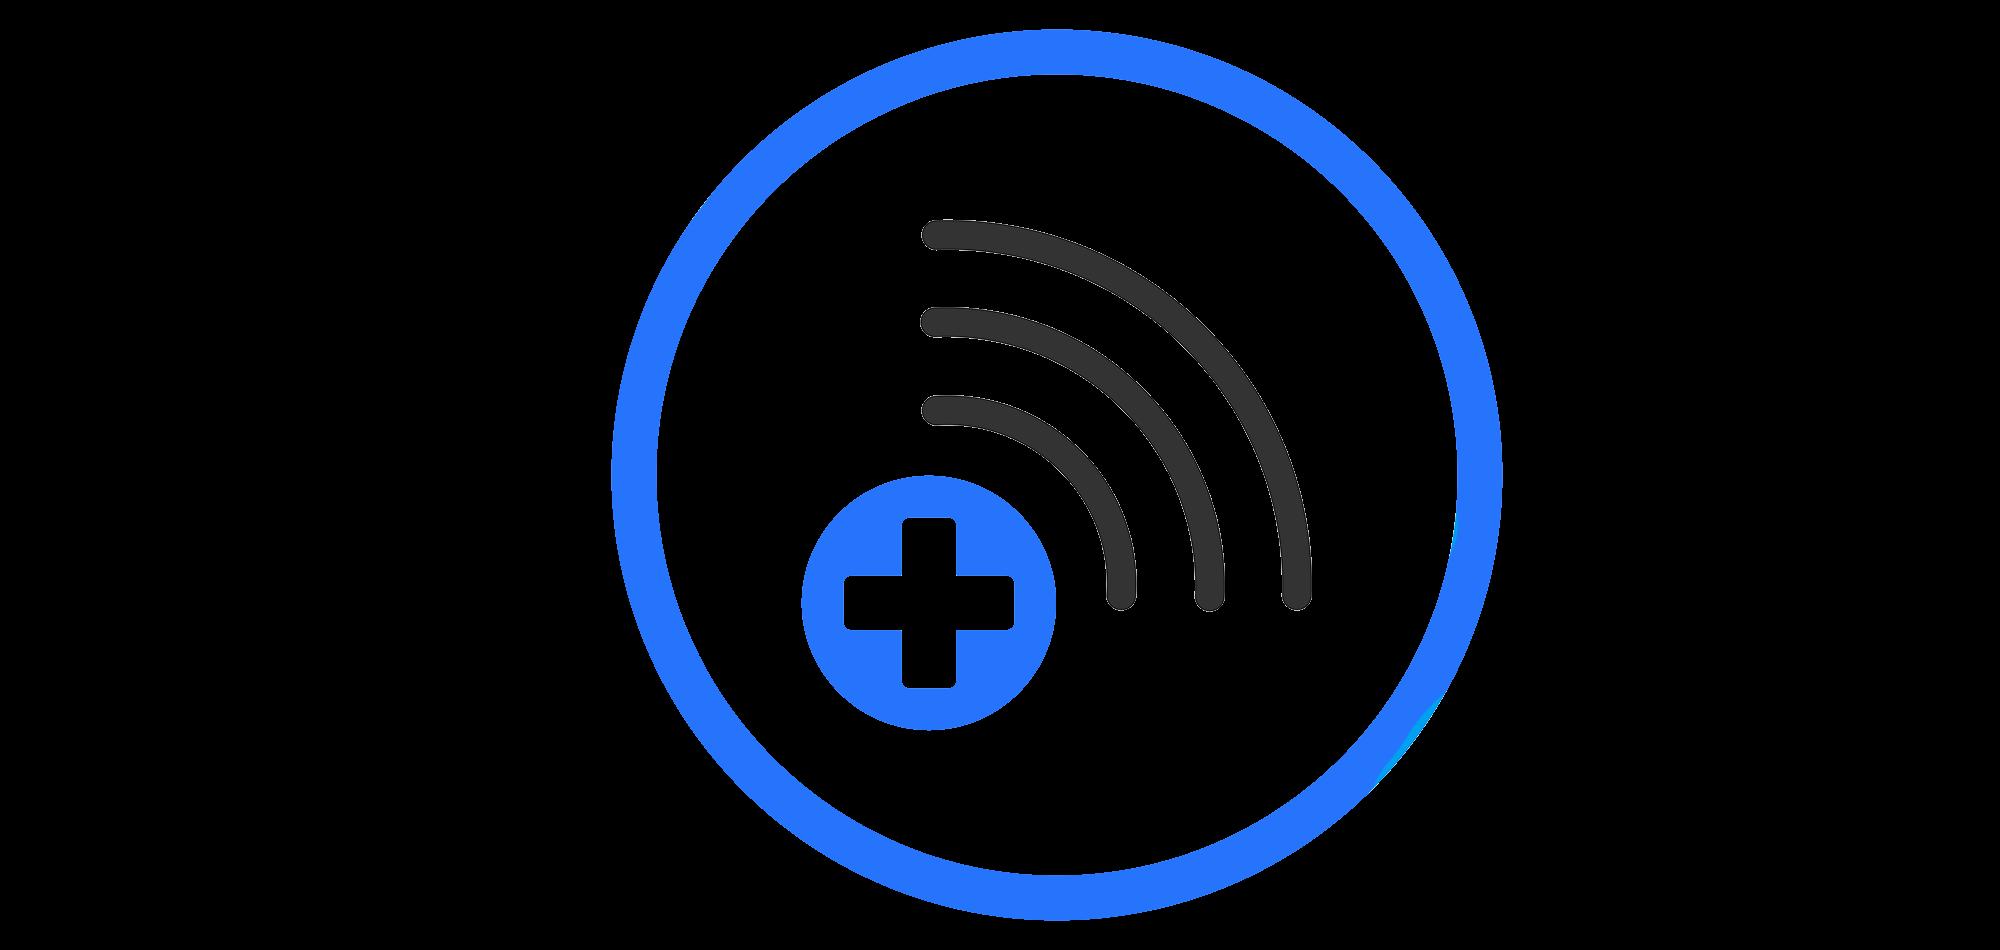 Hospital Wireless Security: How to Provide HIPAA Compliant WiFi Service